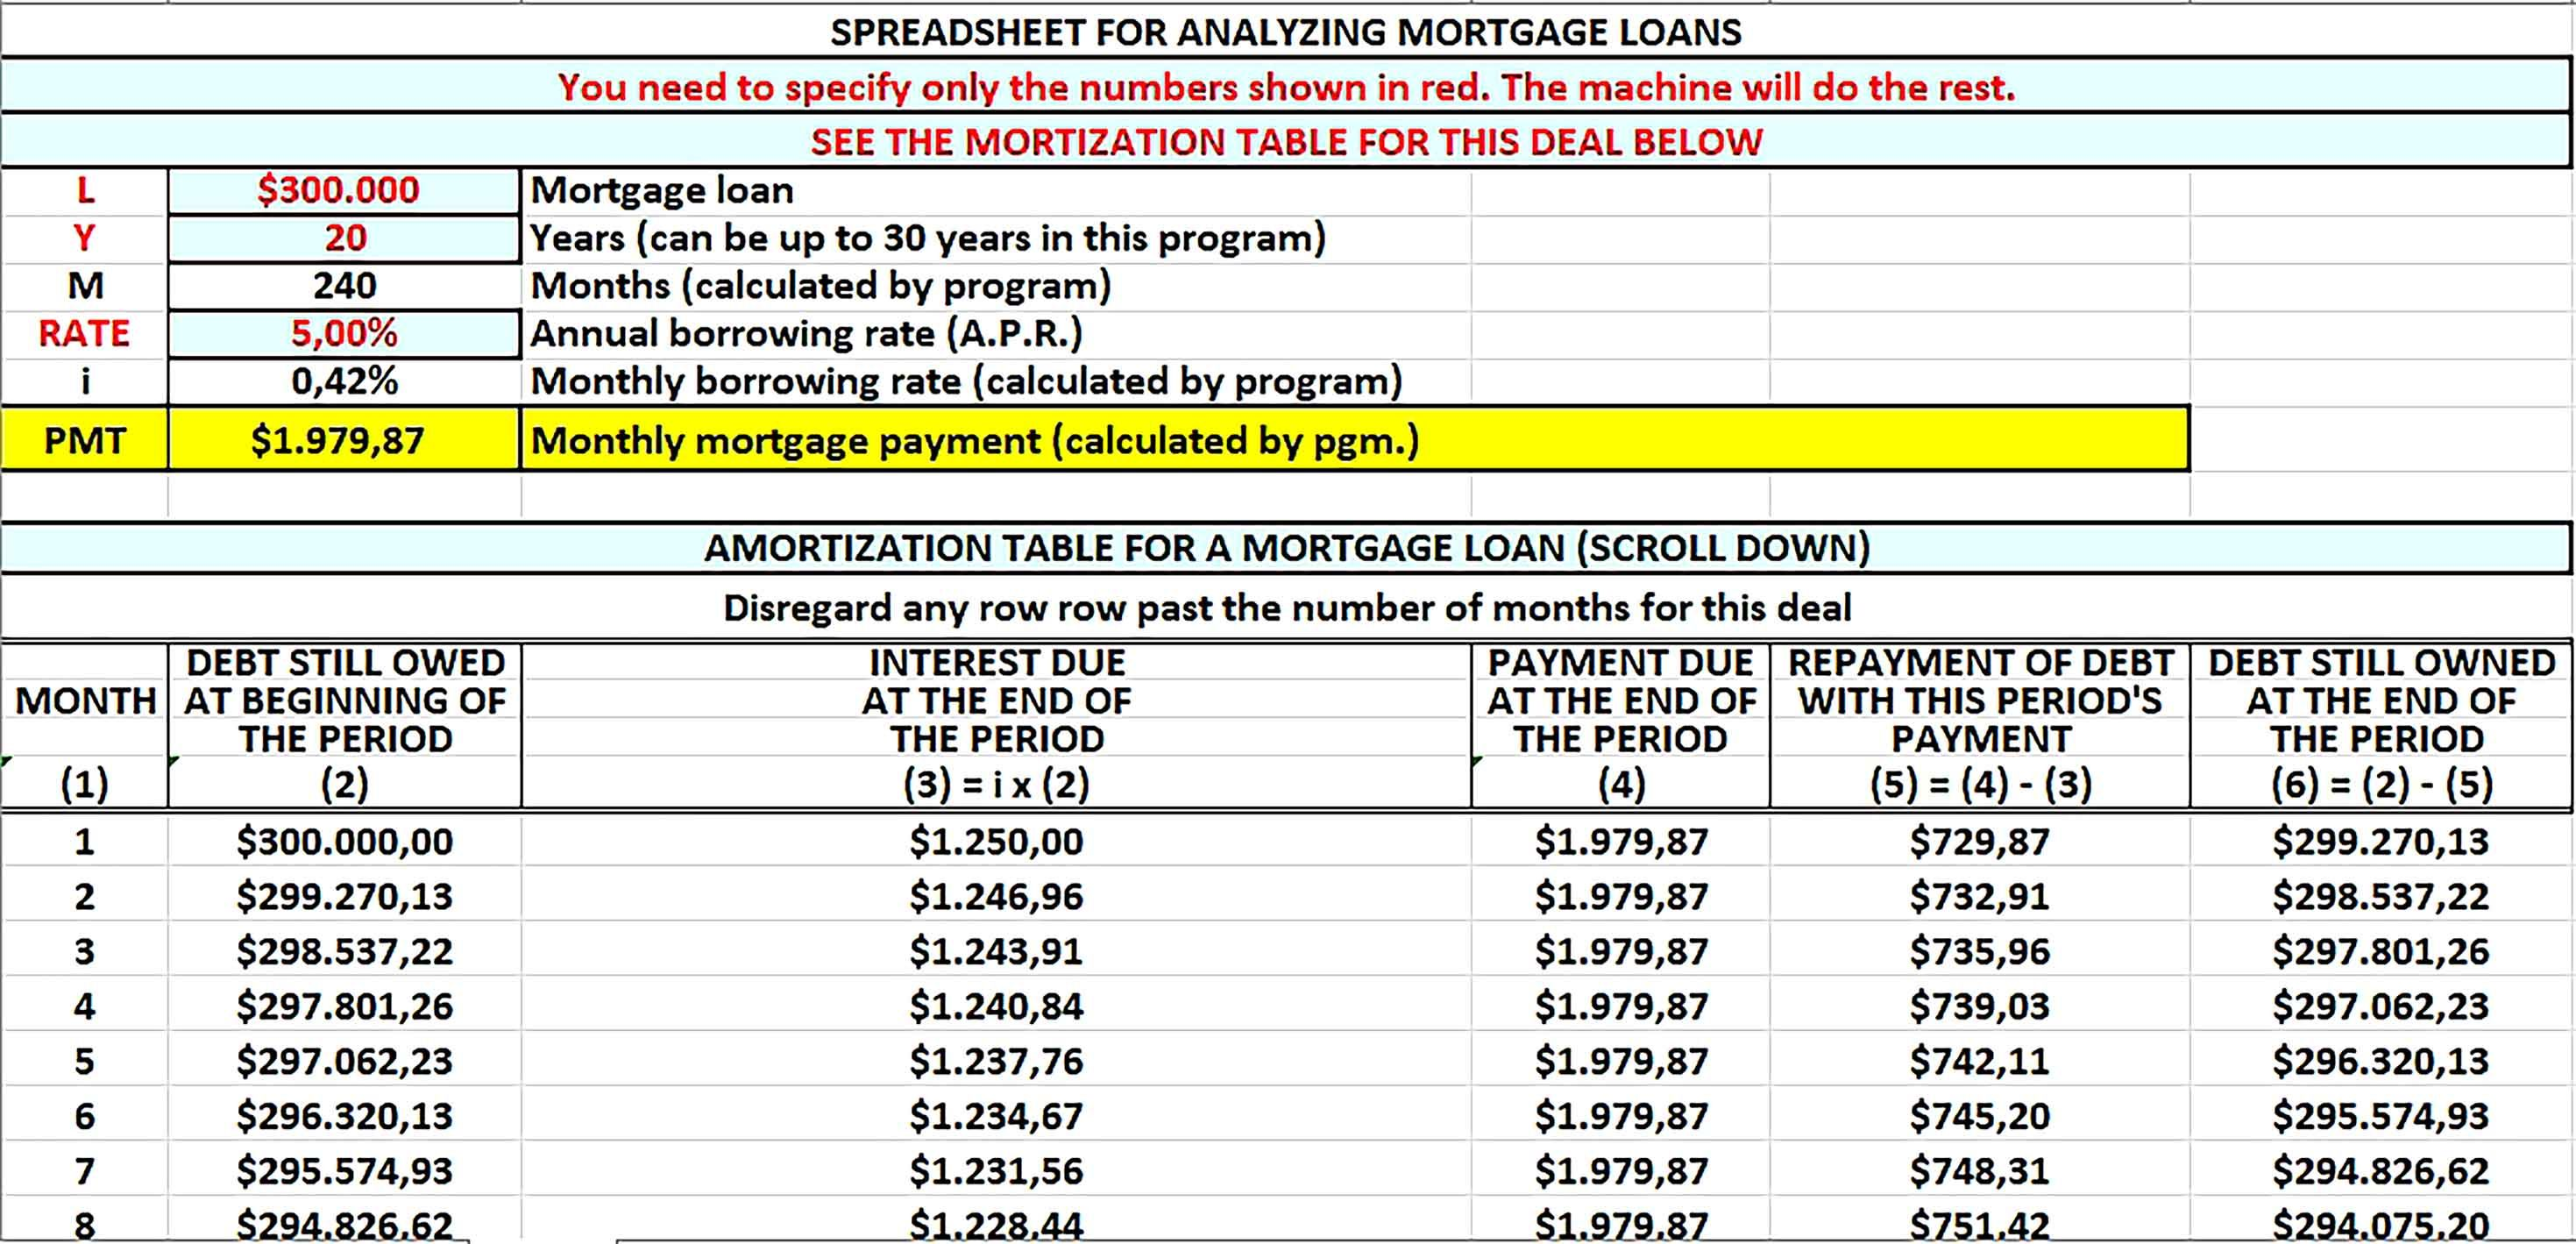 Loan Amortization Schedule Sample Amortization Schedule Schedule Template Loan 20 year amortization schedule excel